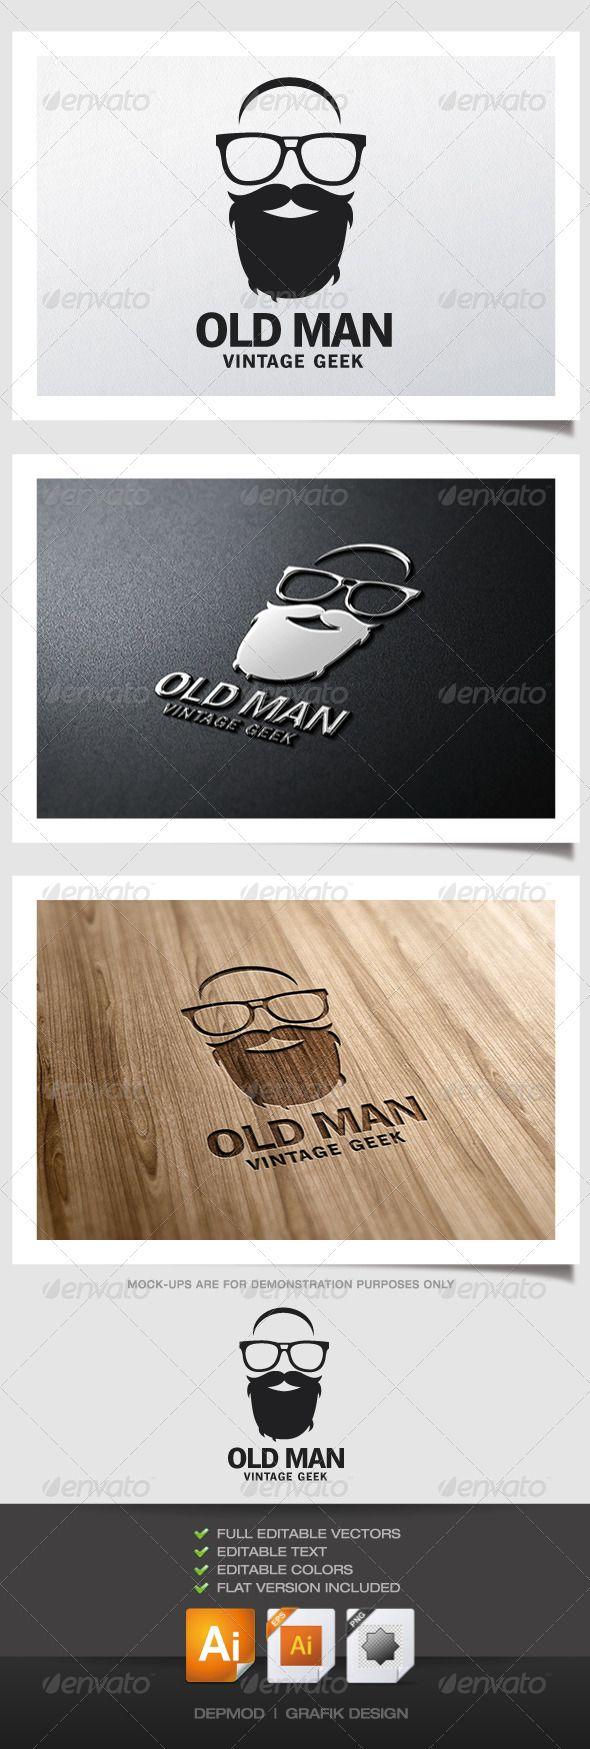 Design your t shirt india - Old Man Logo